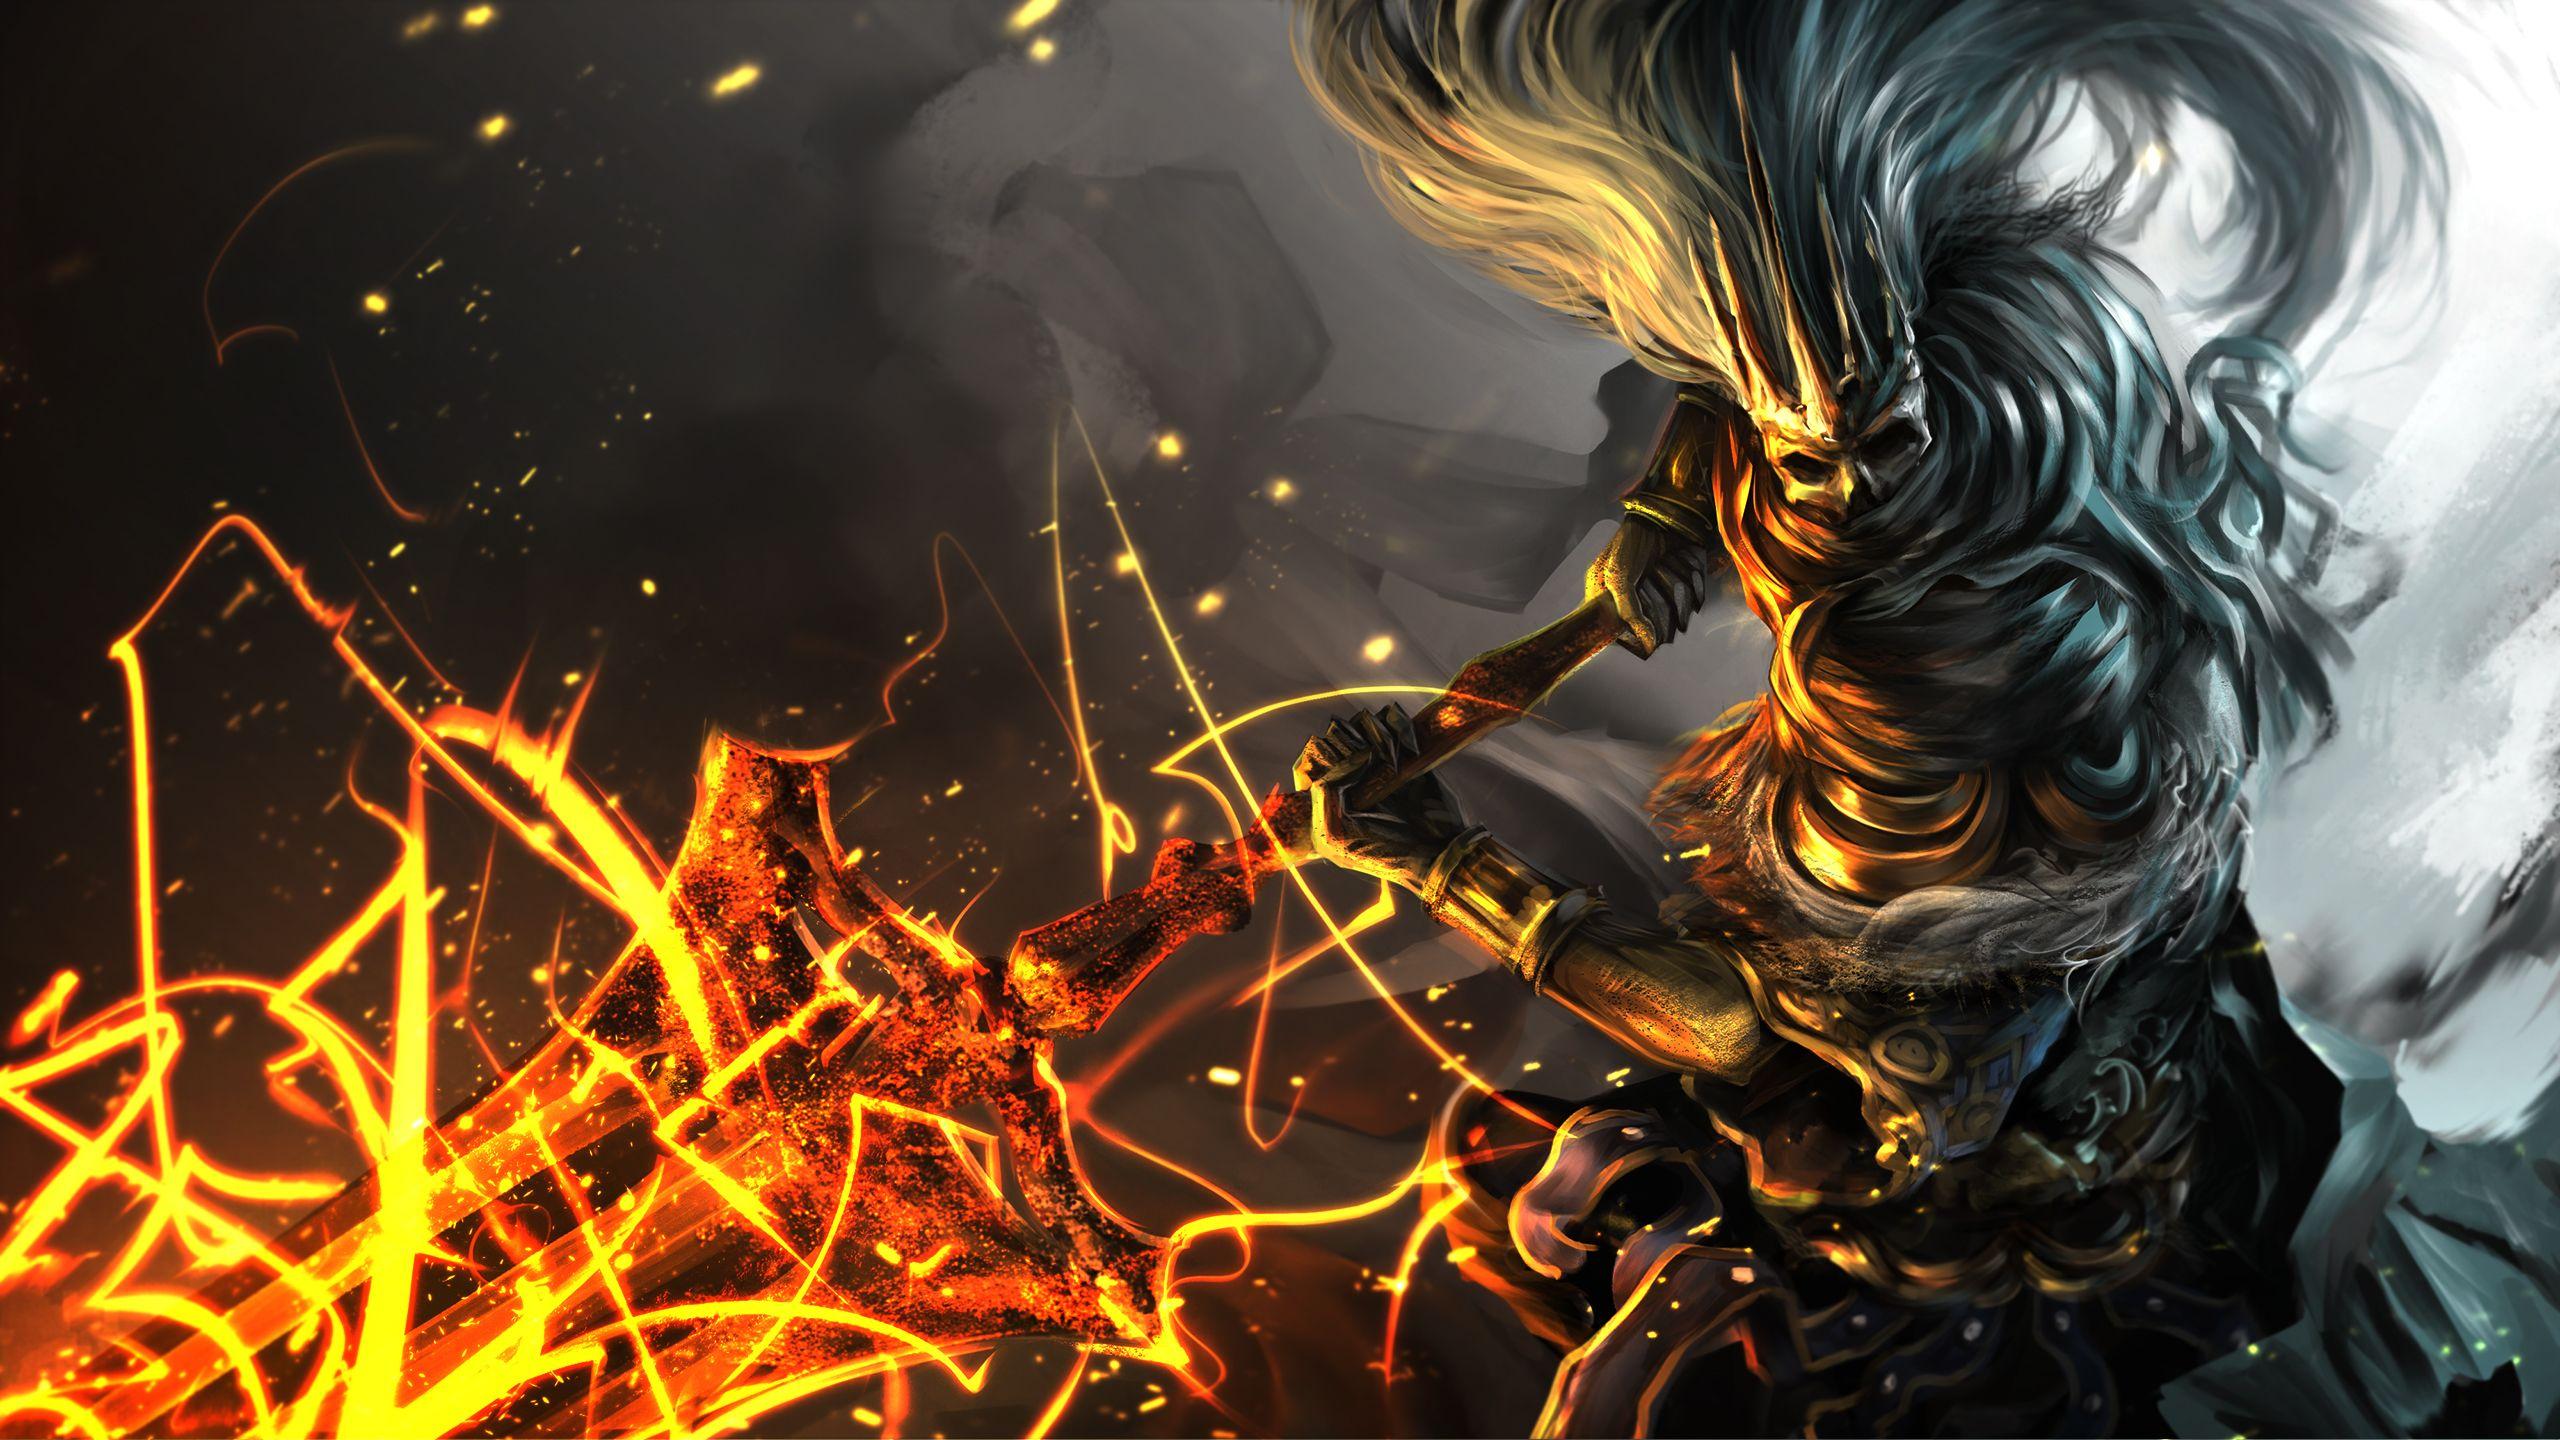 Dark Souls Wallpapers Full Hd Is 4k Wallpaper Dark Souls 3 Dark Souls Wallpaper Dark Souls Art